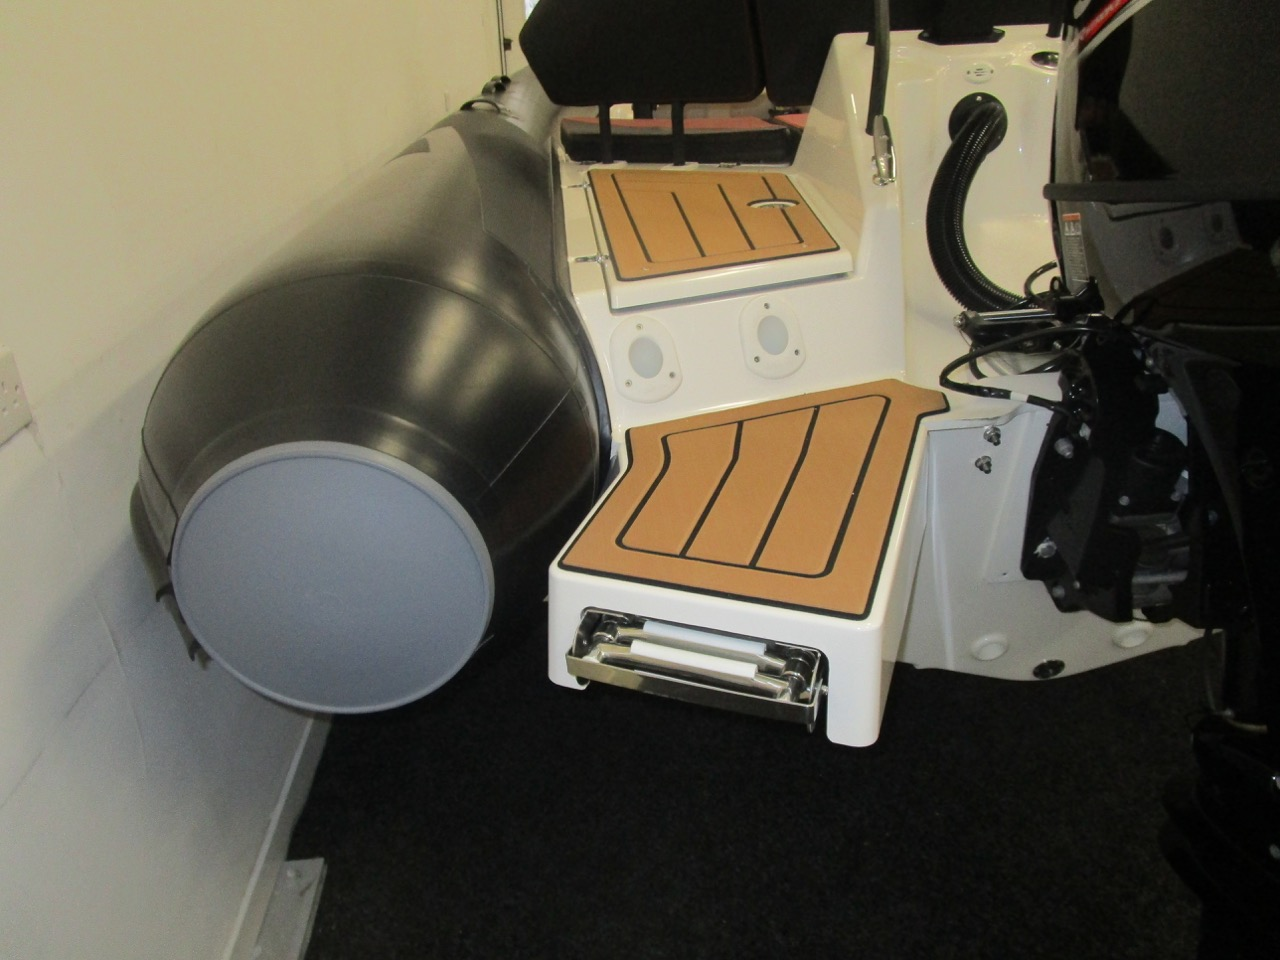 GRAND DRIVE D600 RIB bathing ladder up